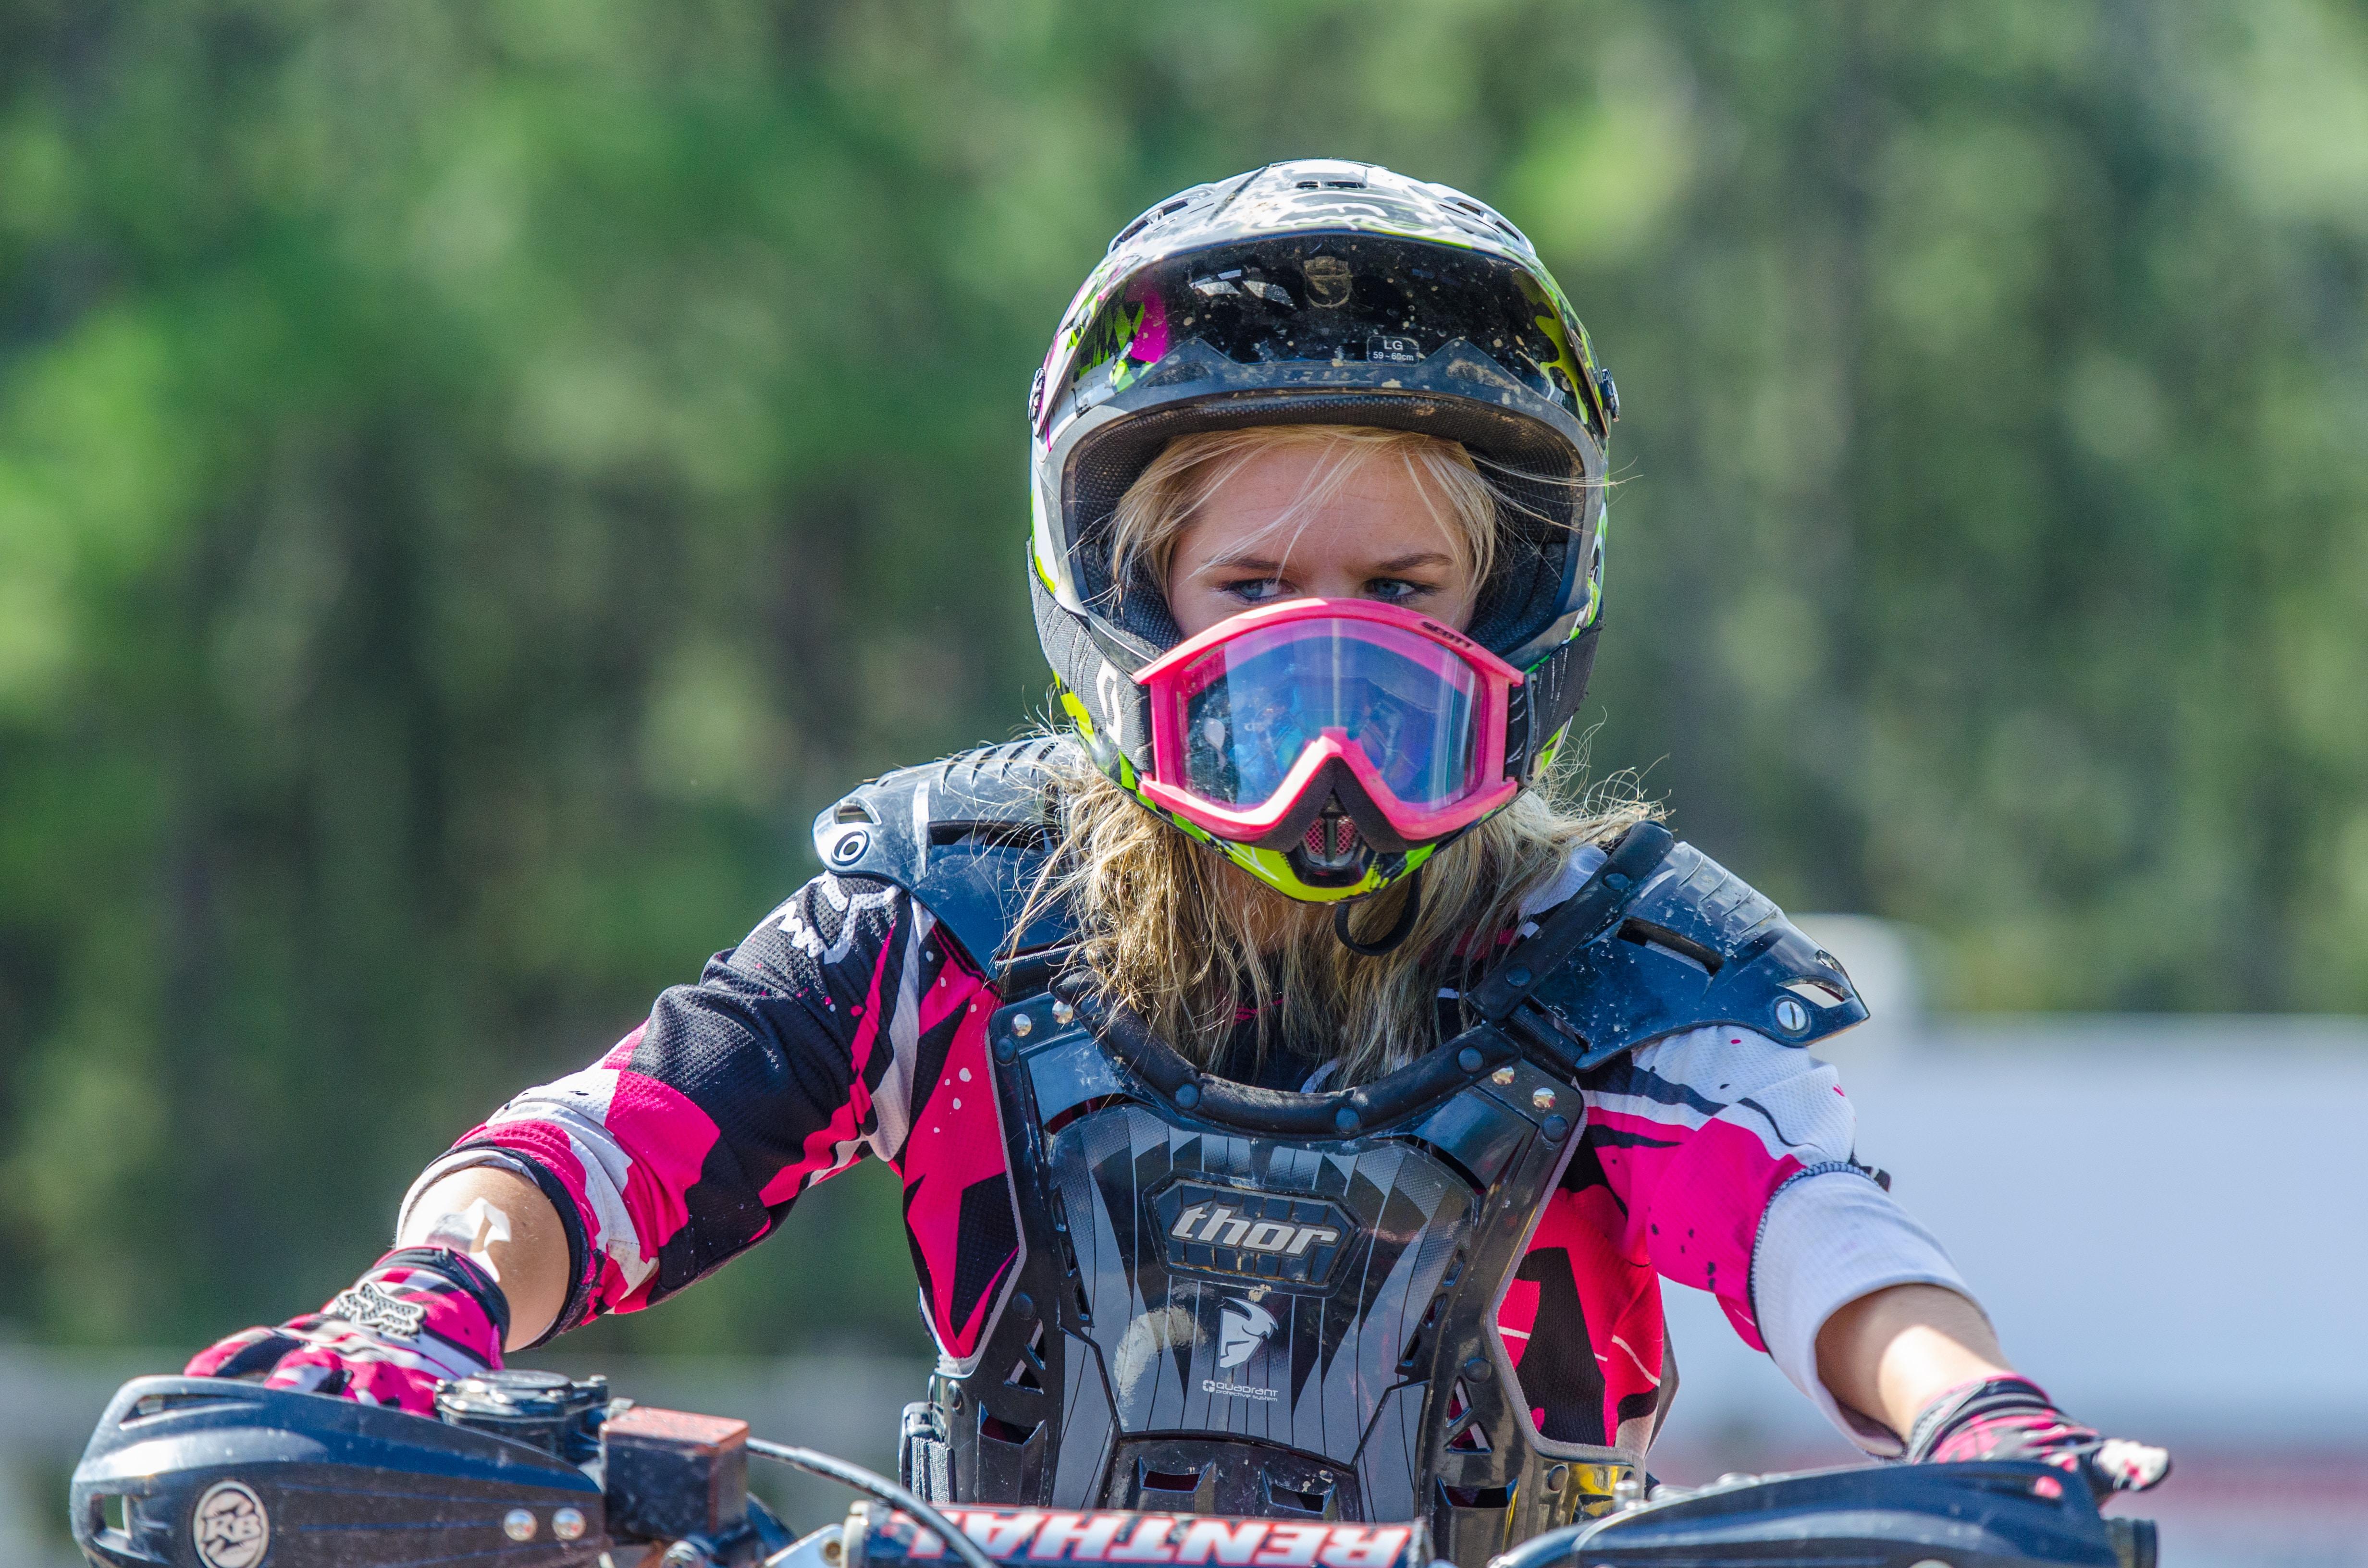 woman riding motocross dirt bike at daytime